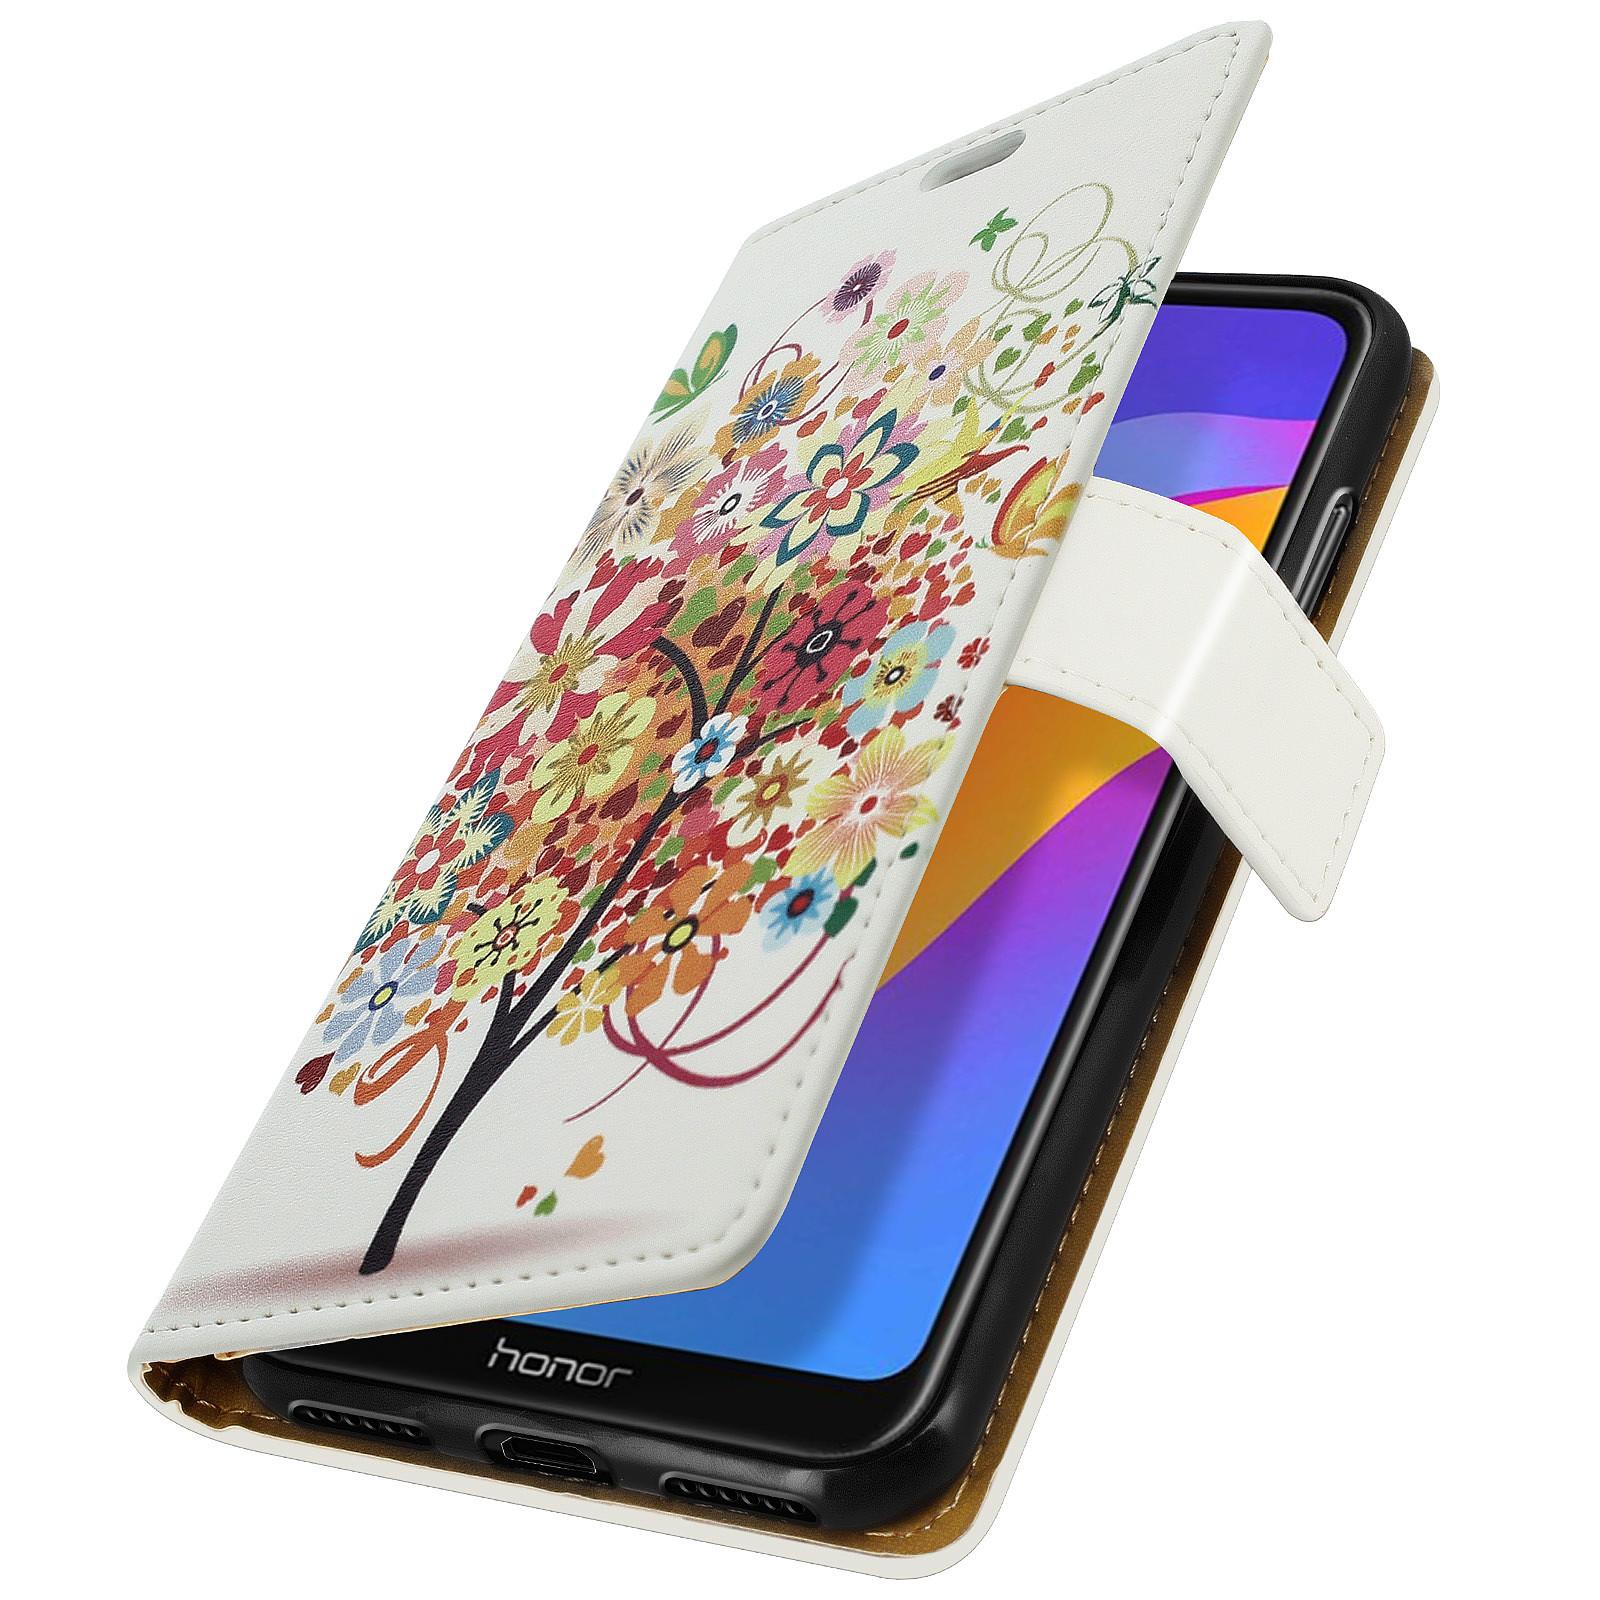 Avizar Etui folio Multicolore pour Honor 8A , Huawei Y6 2019 , Huawei Y6S , Honor 8A 2020